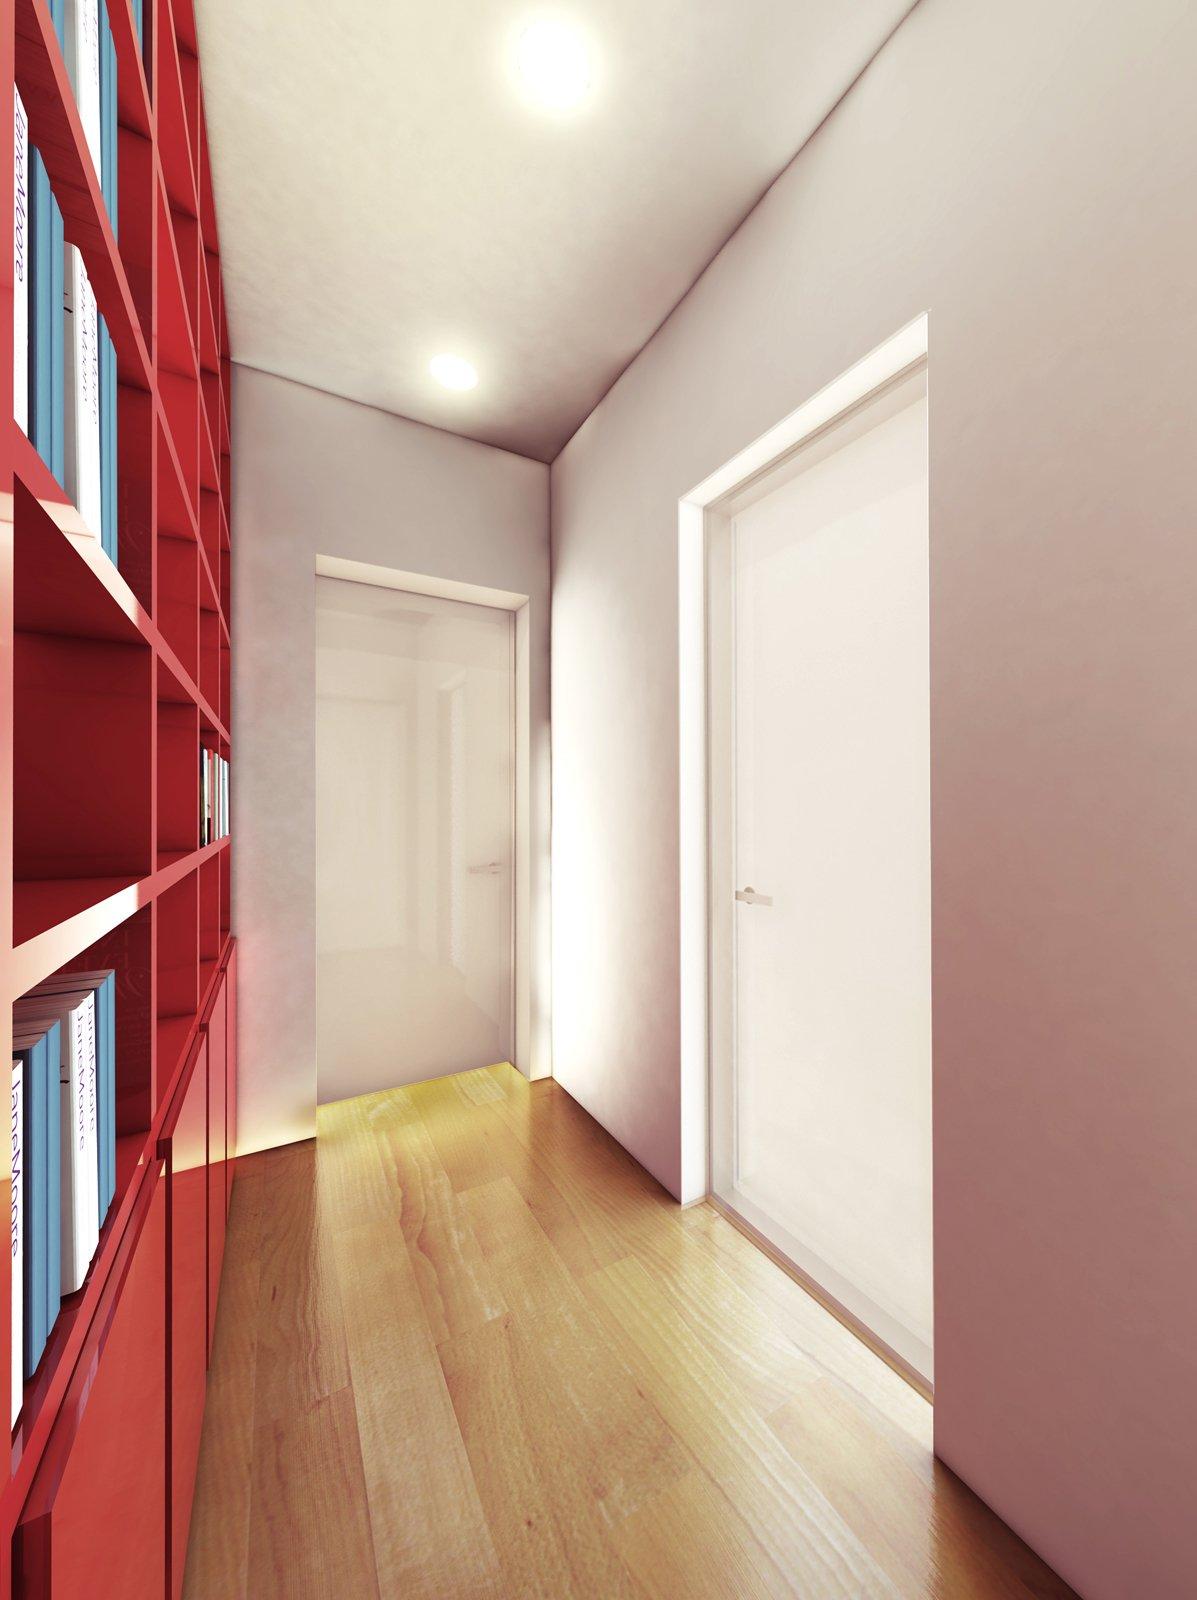 Pi luce 10 idee per moltiplicarla cose di casa for Lampadari per vani scale